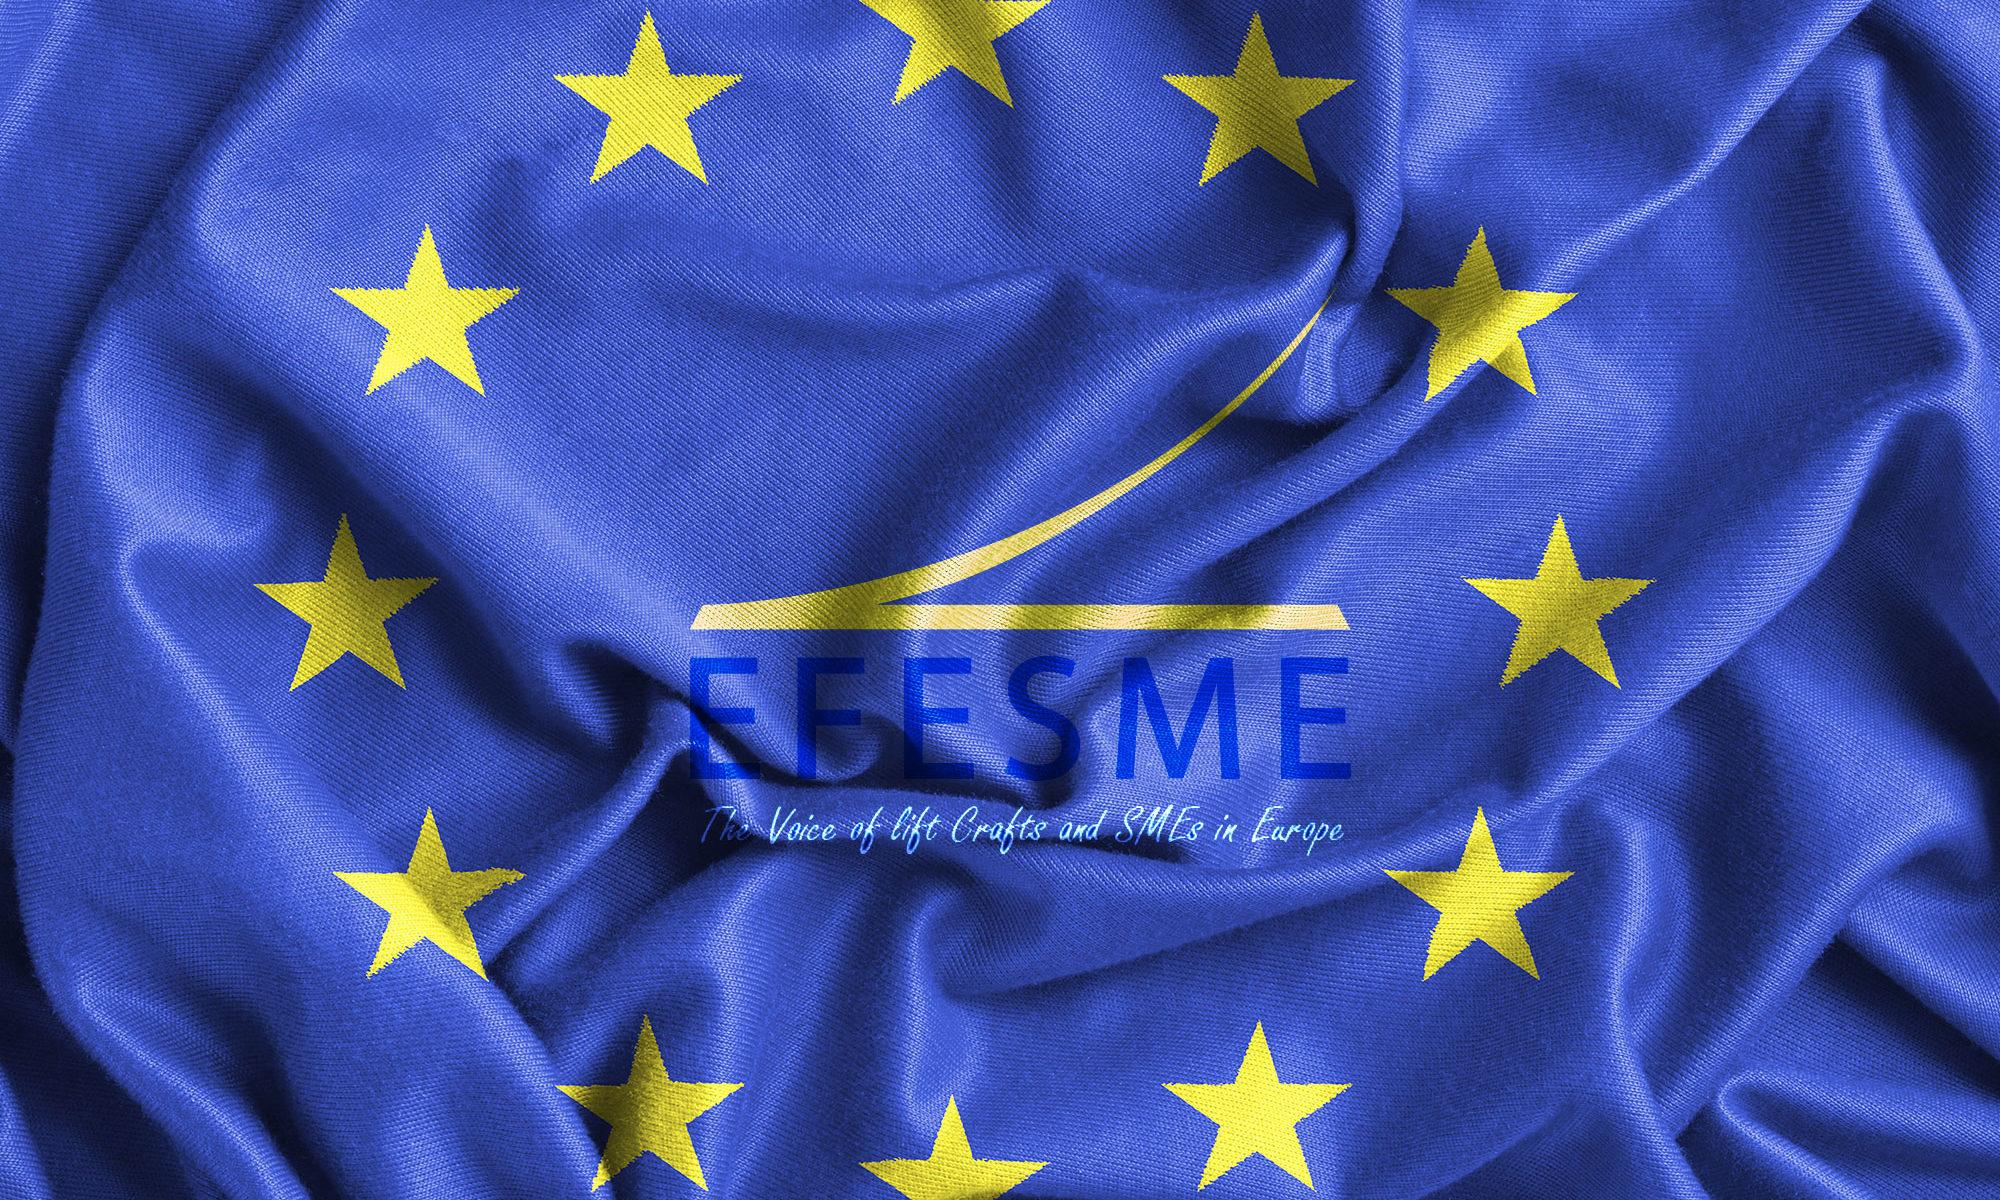 Eventos celebrados en Bruselas por parte de EFESME